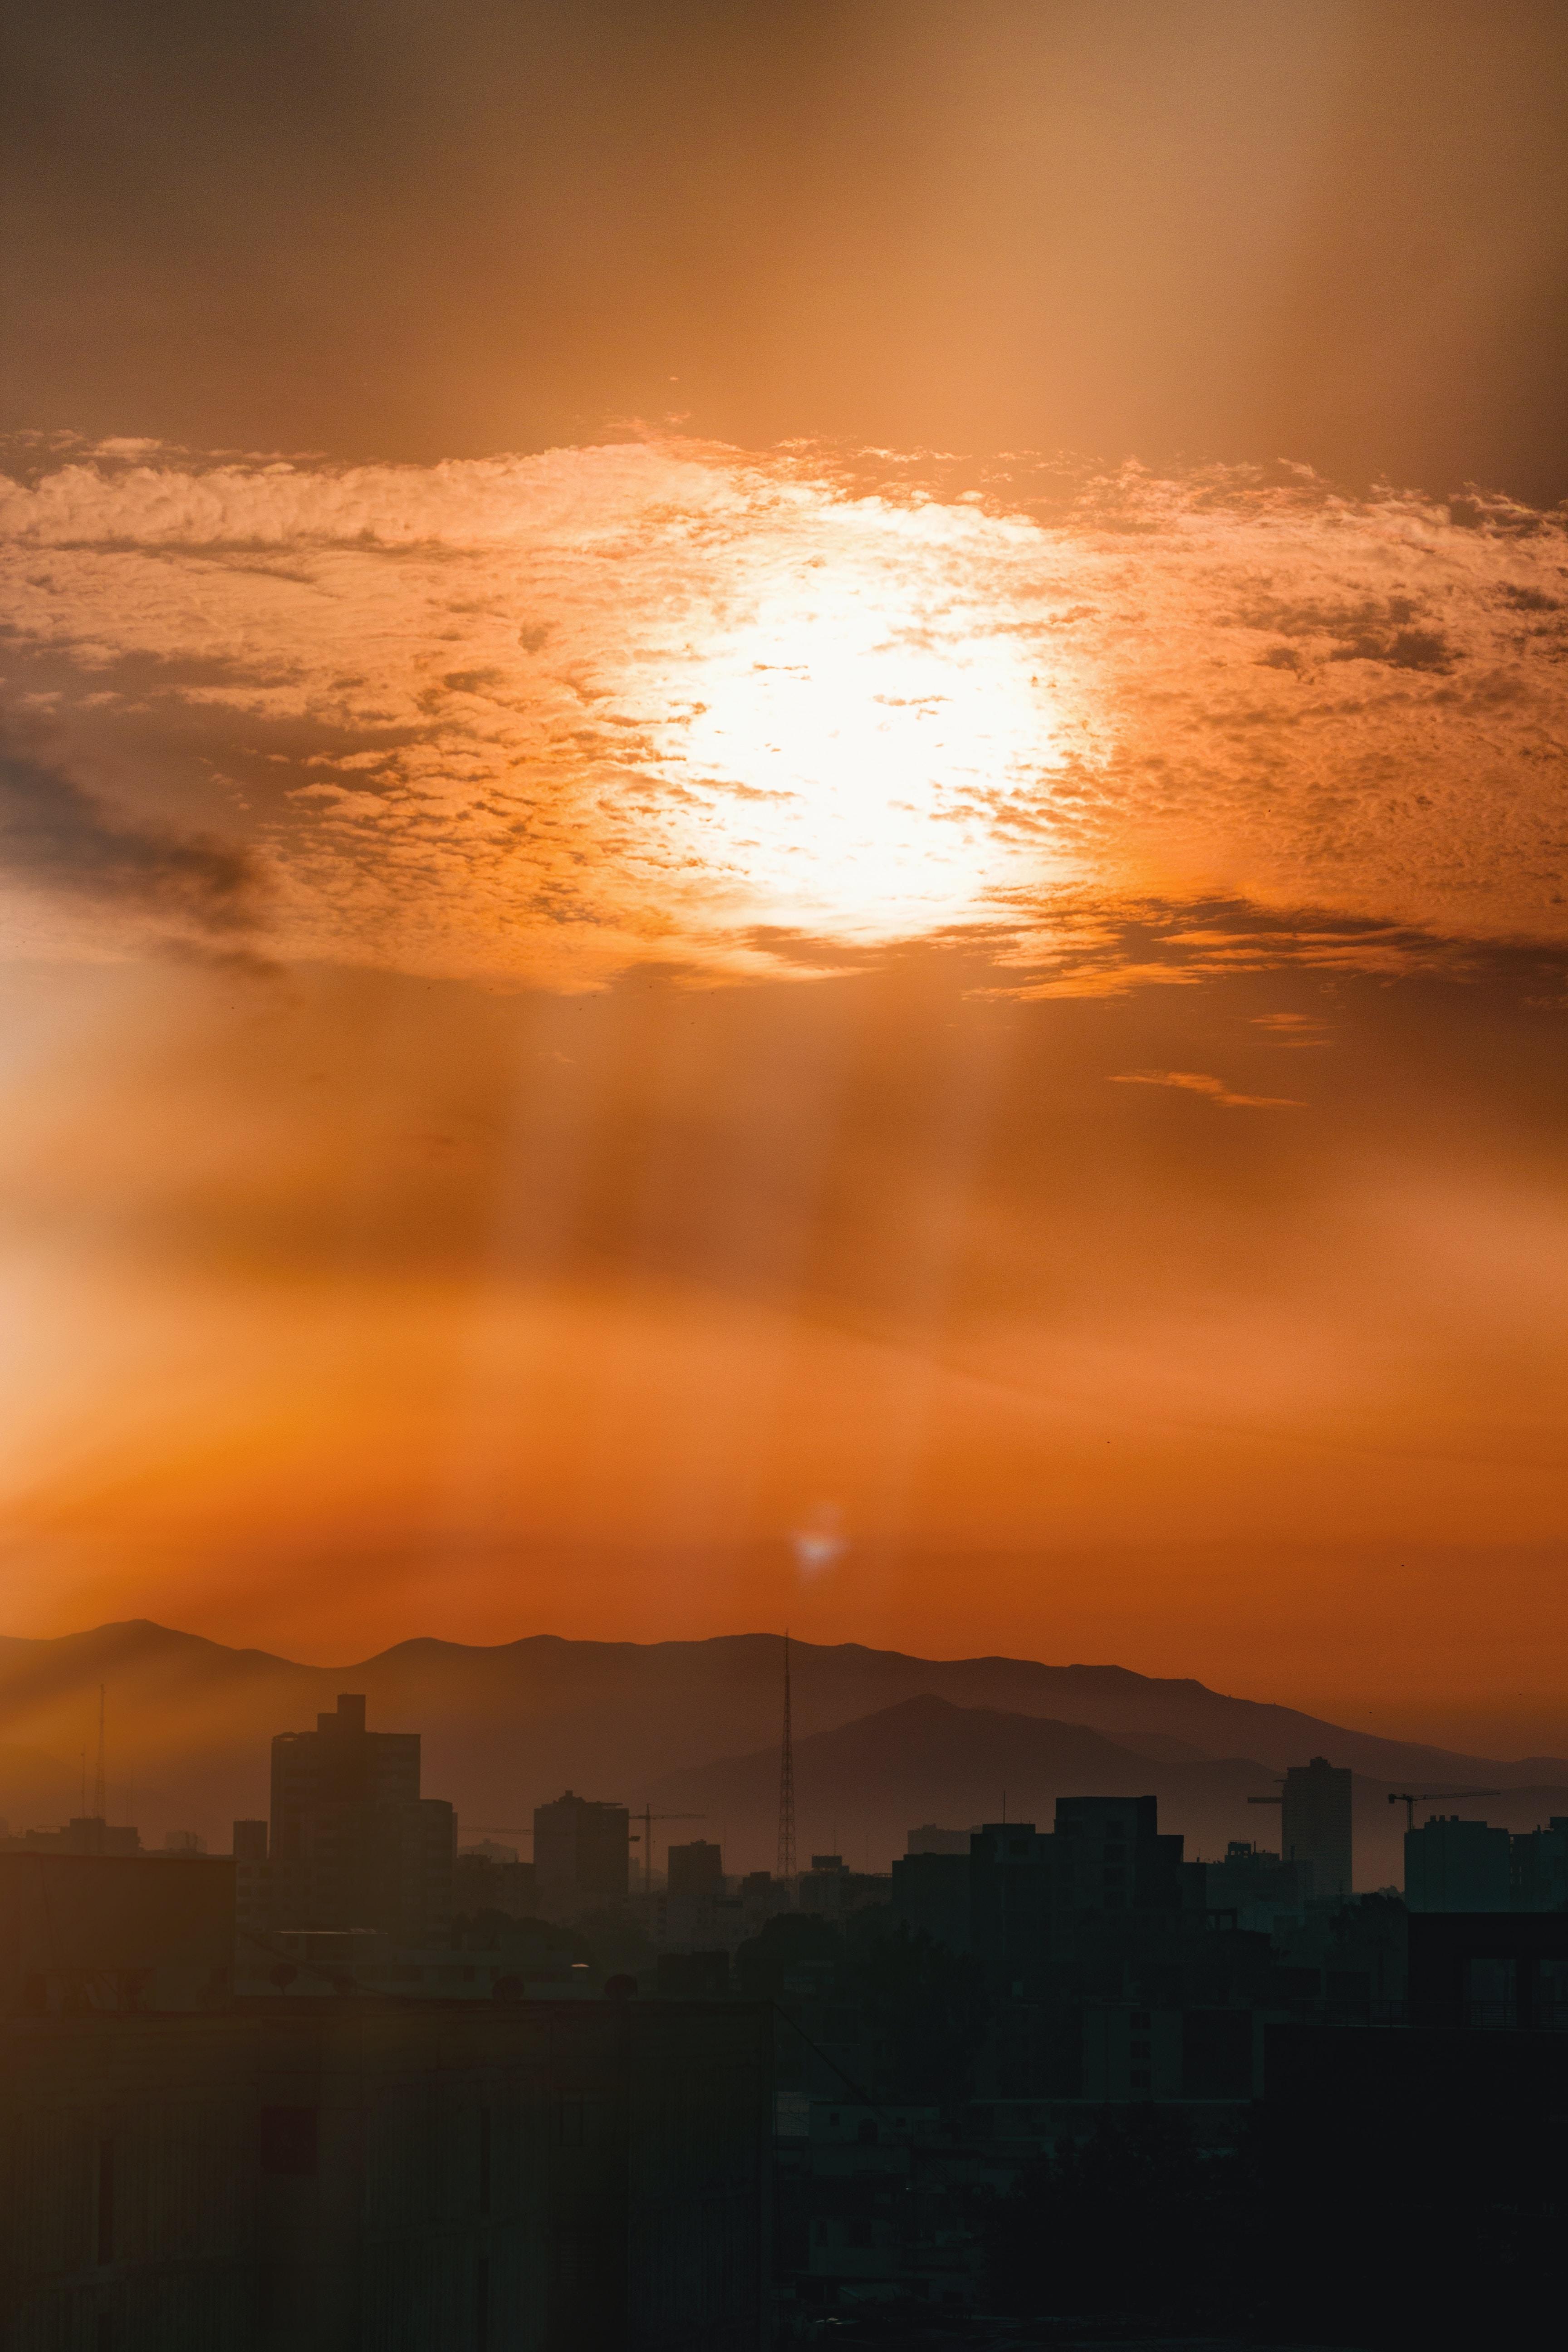 orange sunset above buildings